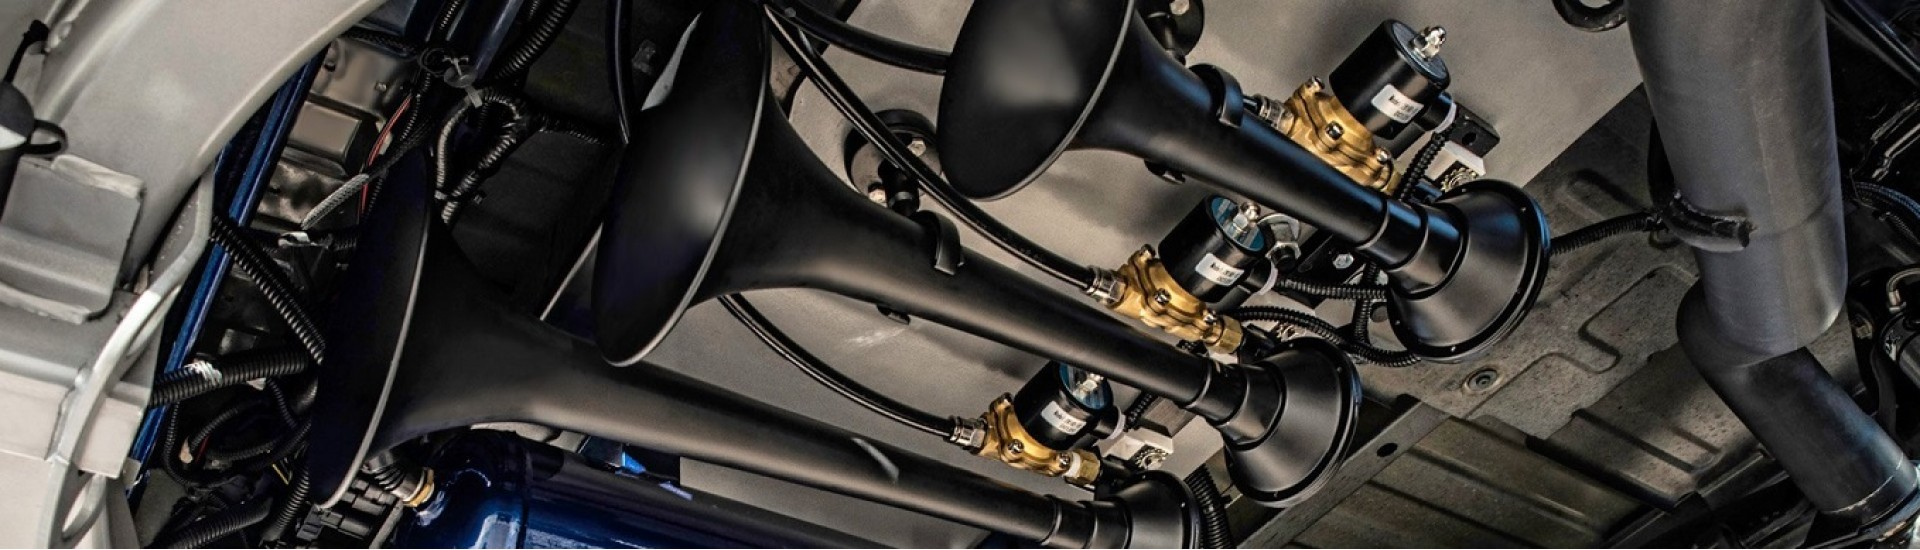 بوق ، قیمت بوق ، بوق فابریک ، automotive horns